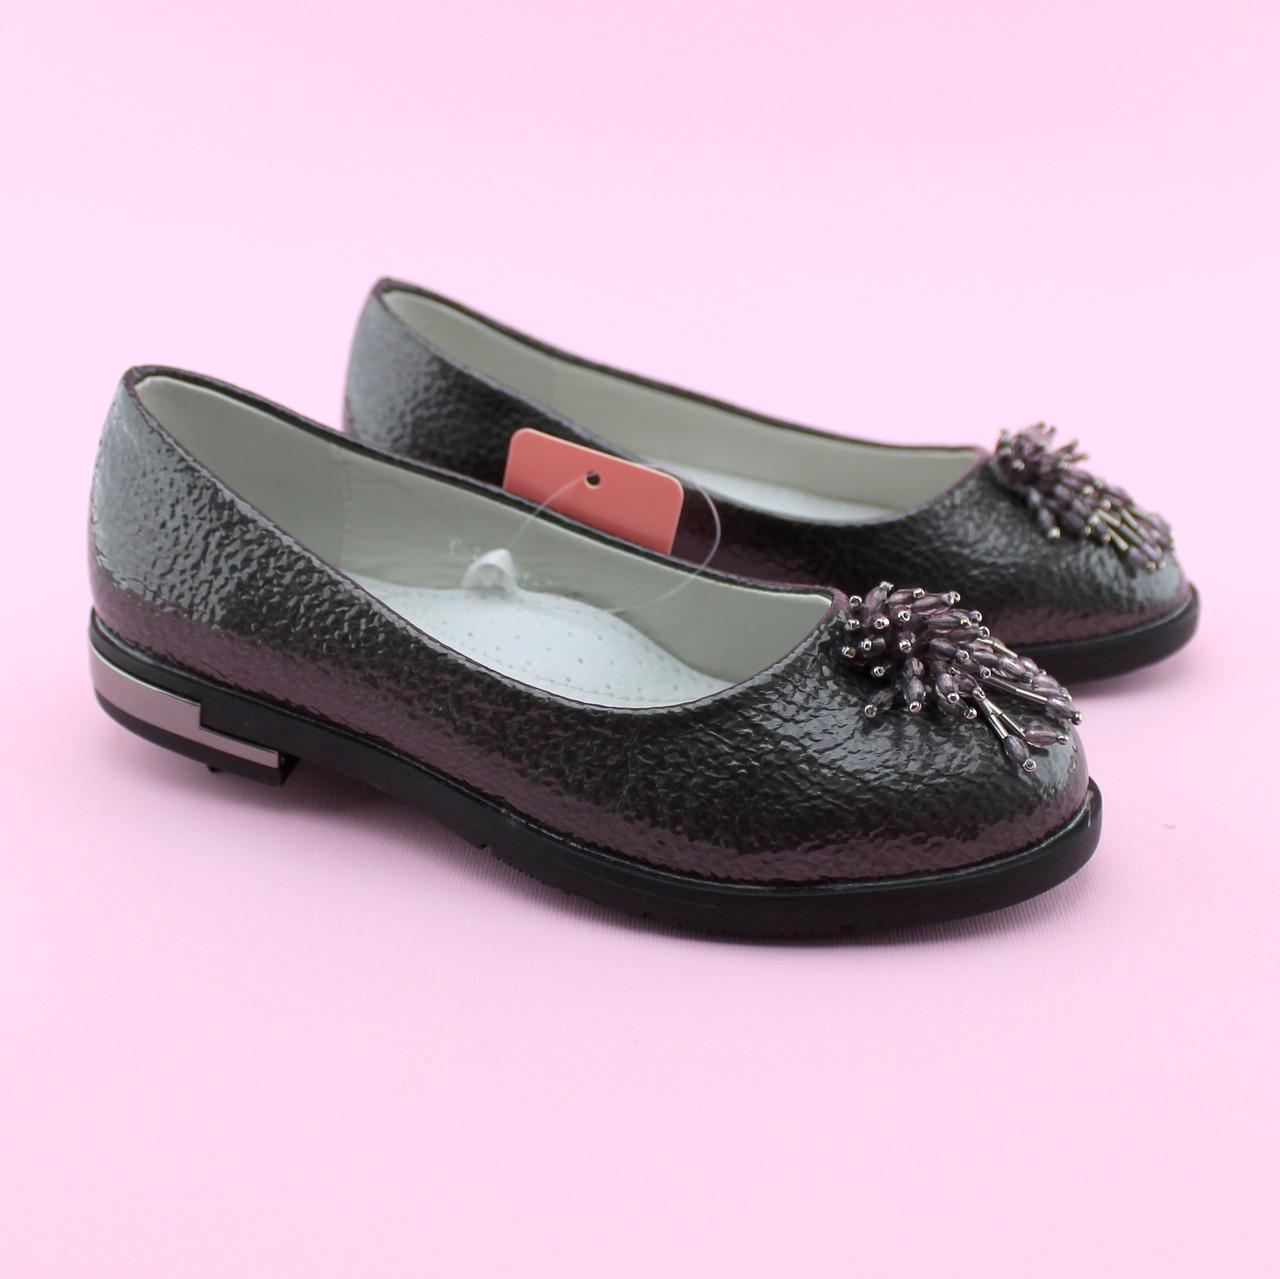 Туфли для девочки Серебро тм Том.М размер 32,33,34,35,36,37